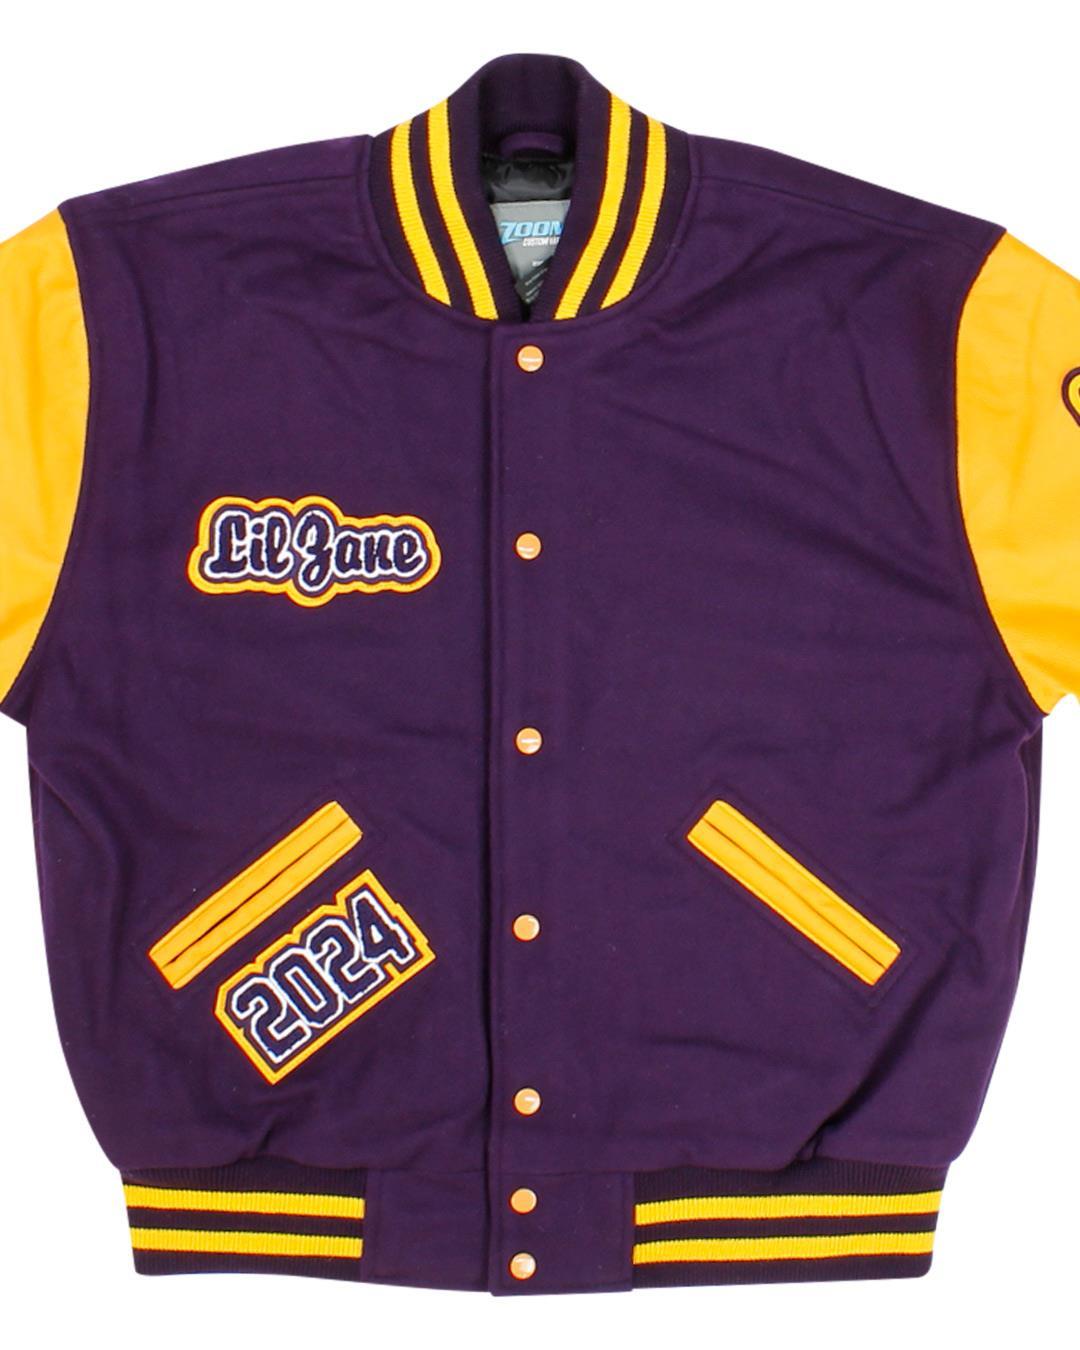 Fowler High School Letterman Jacket, Fowler CO